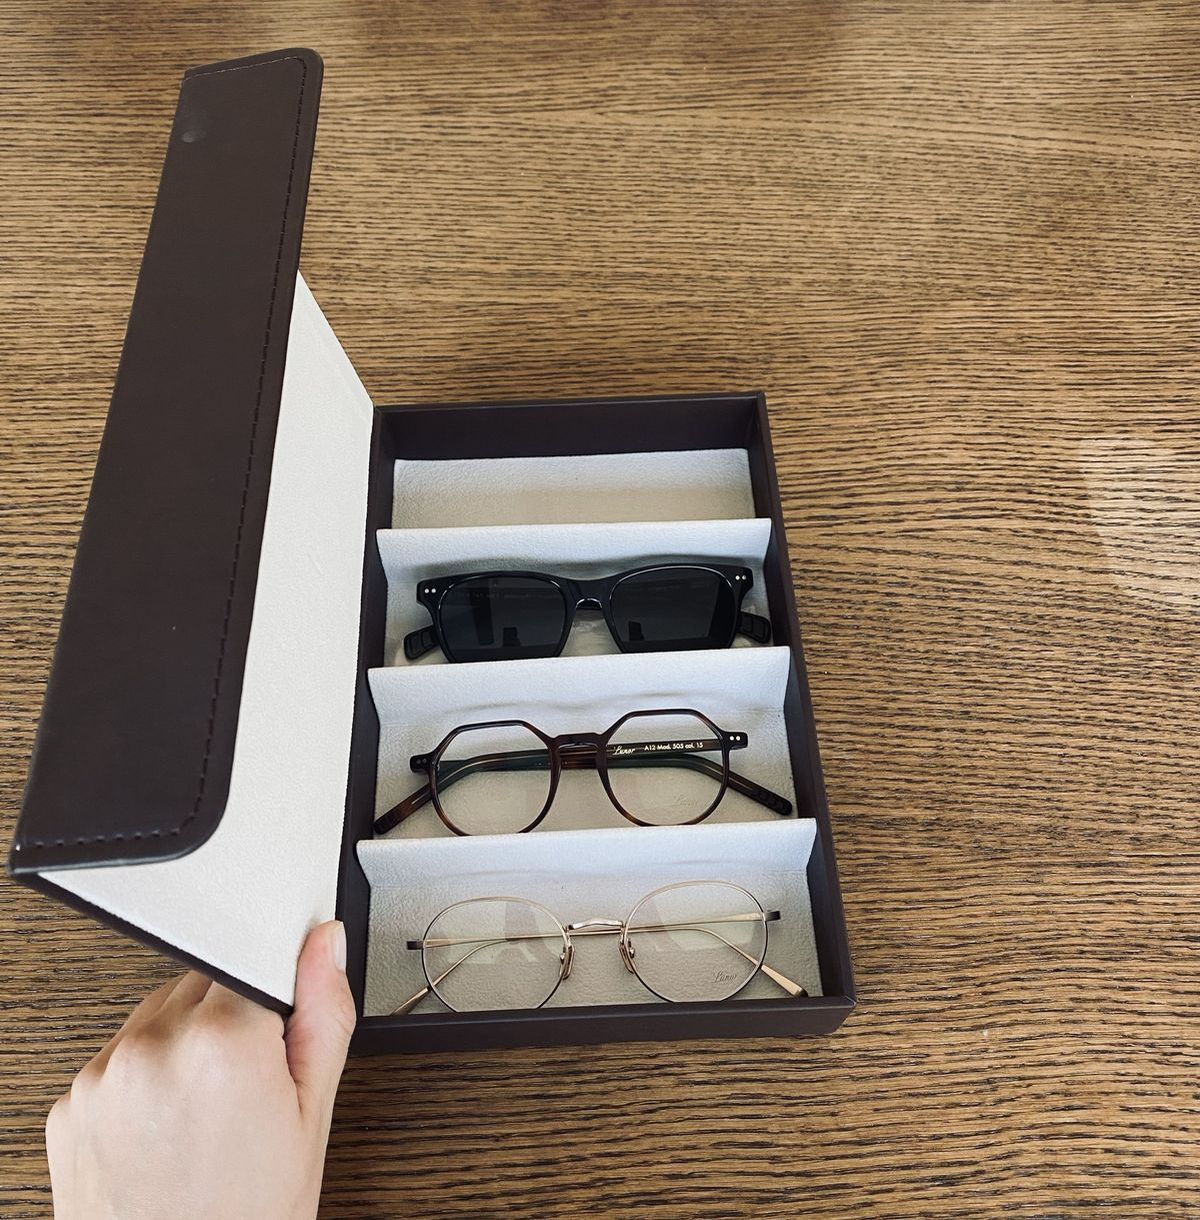 Lunor-Brillen